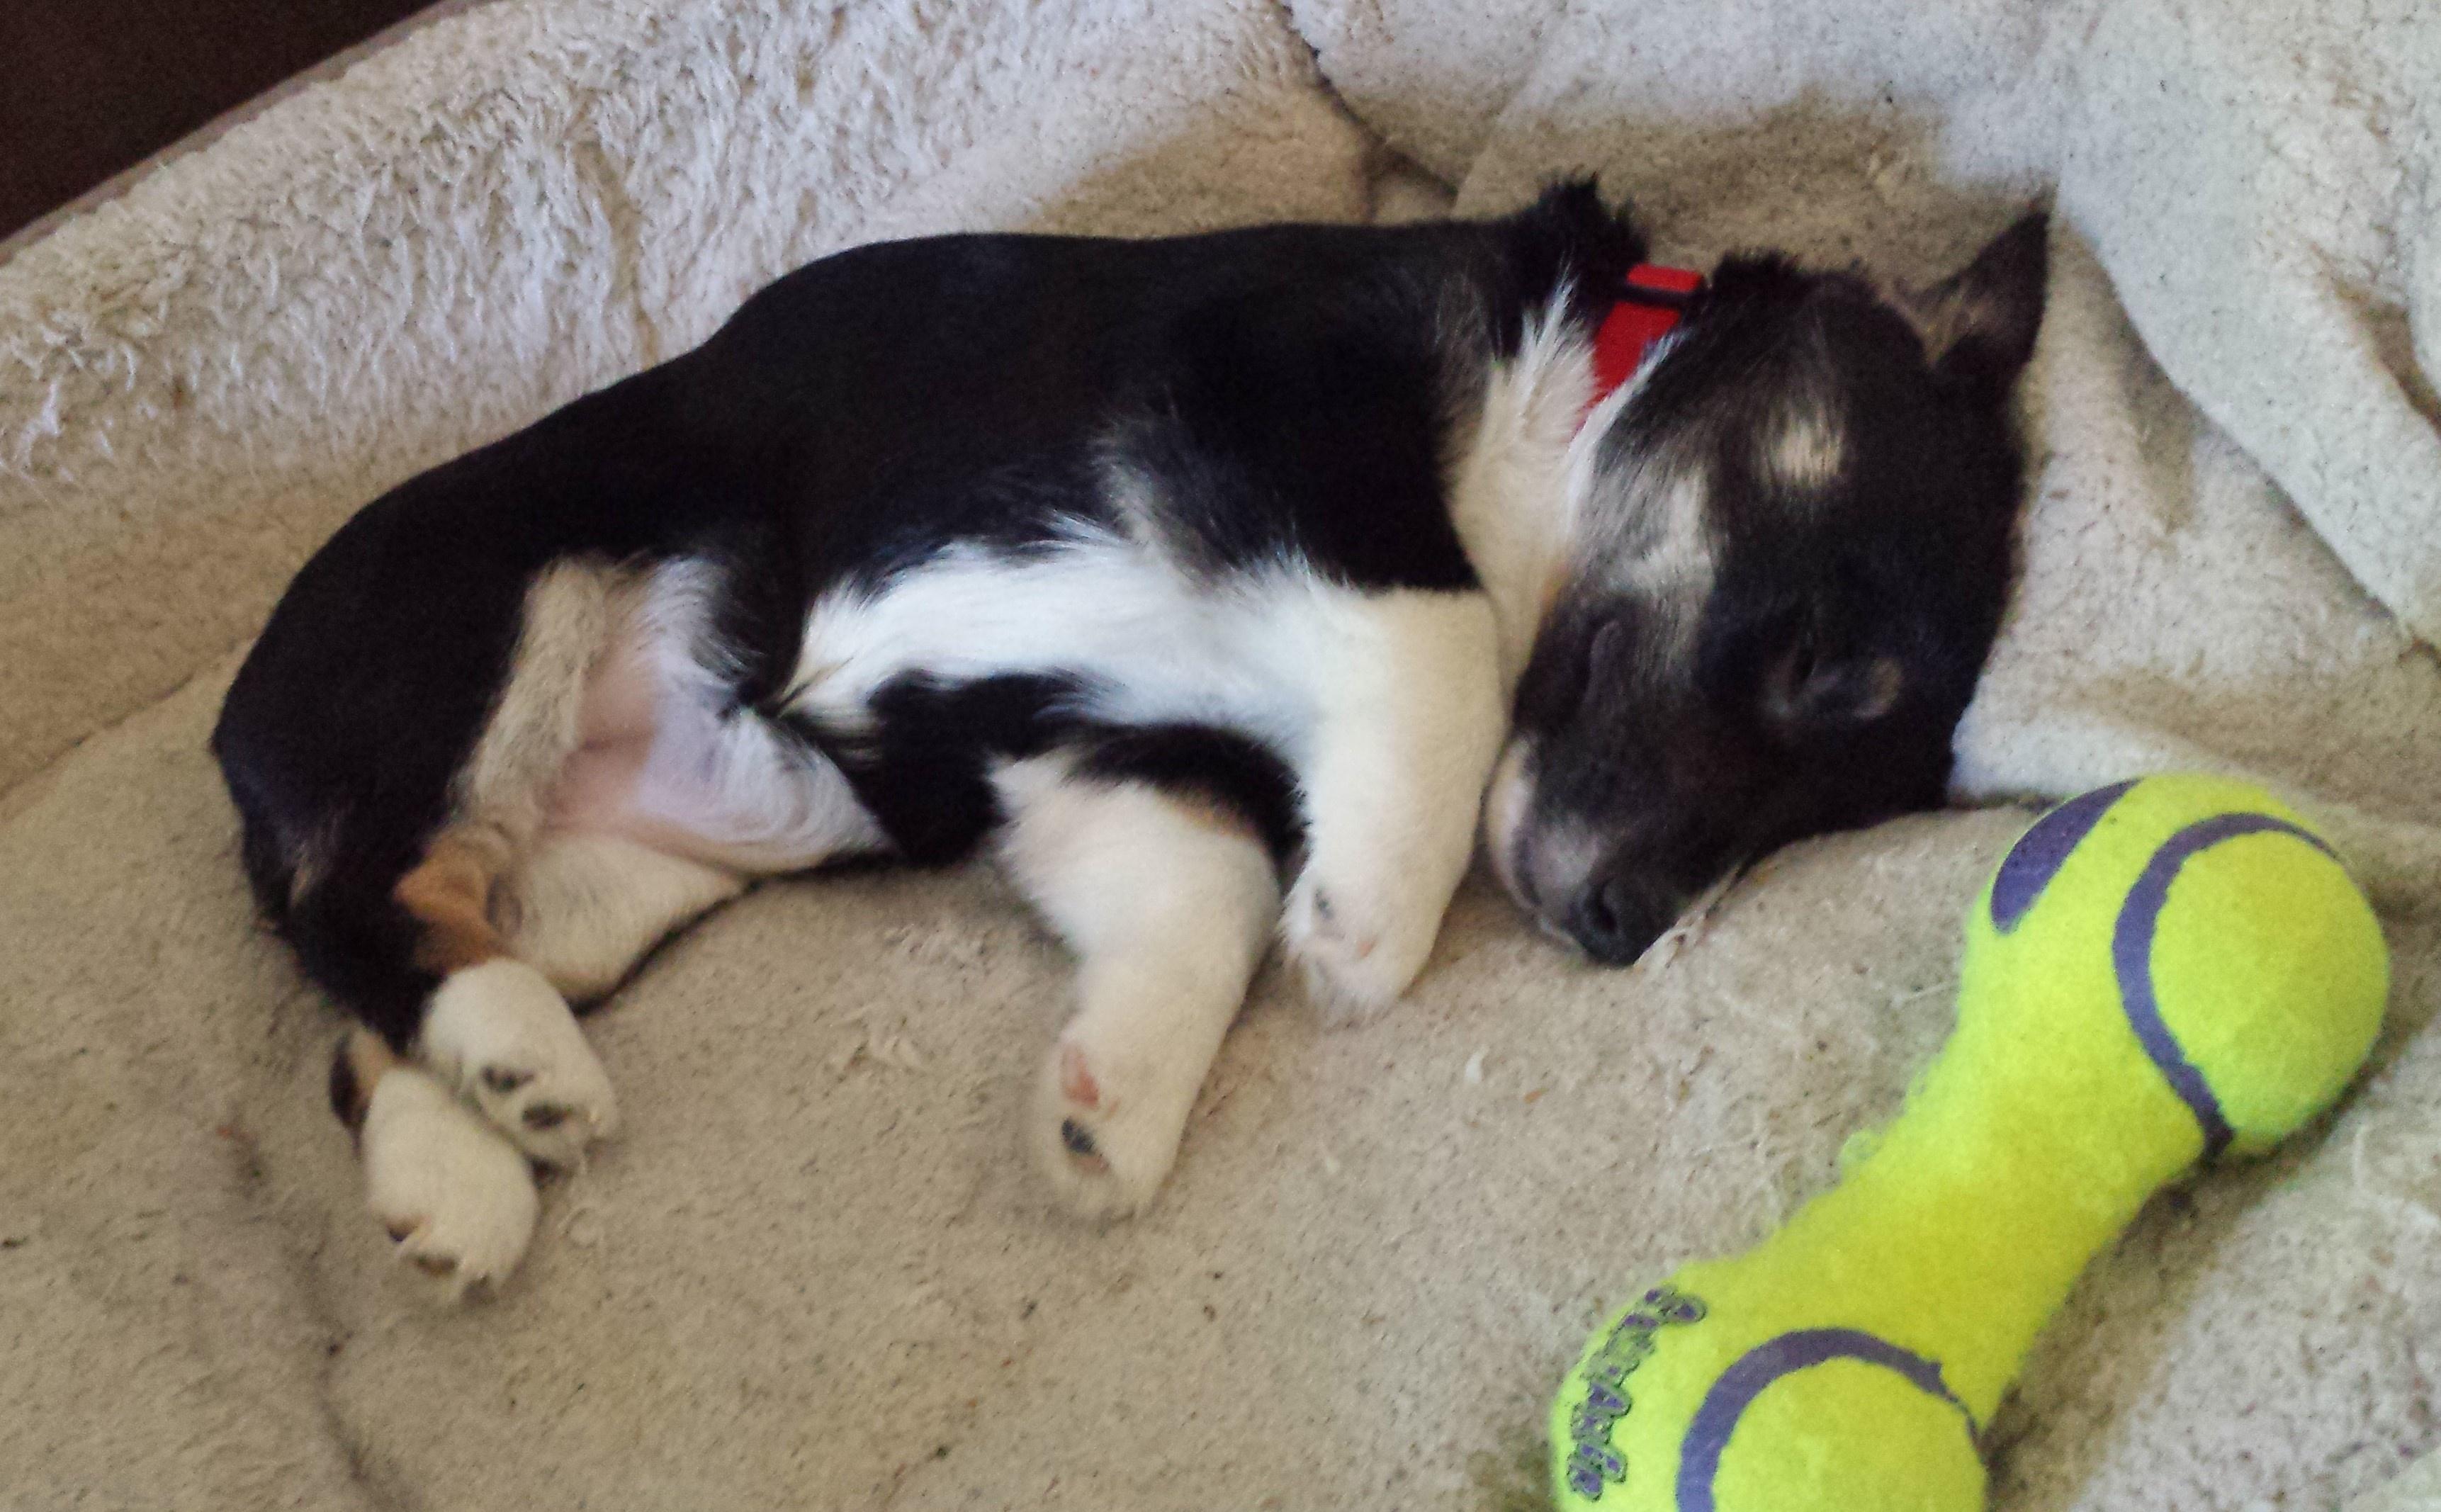 Why does my dog sleep facing a corner? - Quora